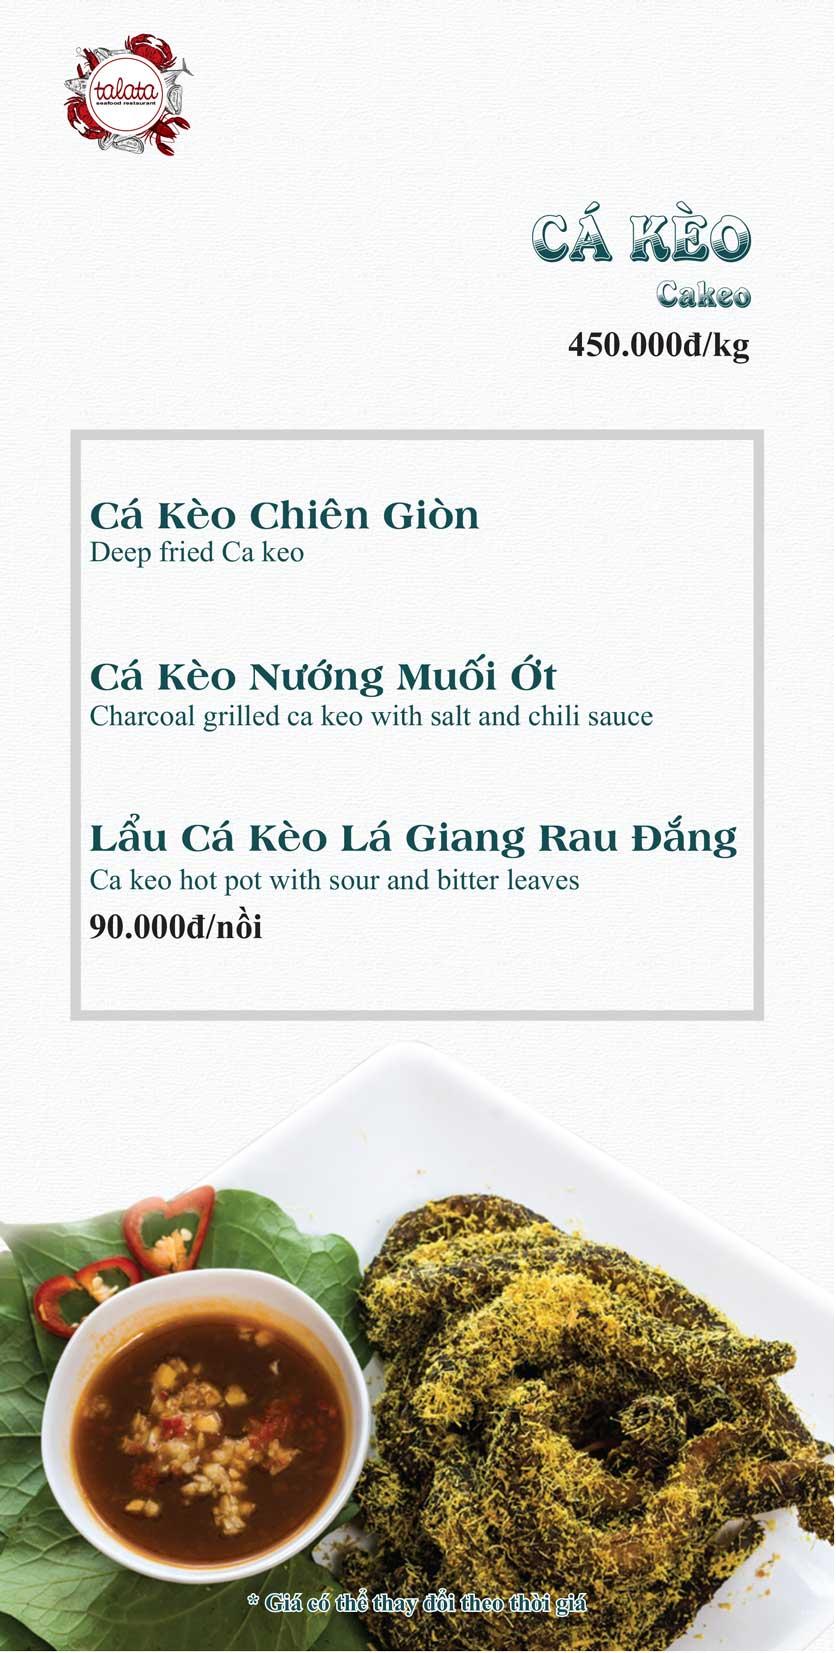 Menu Hải Sản Talata - Huỳnh Thúc Kháng 17